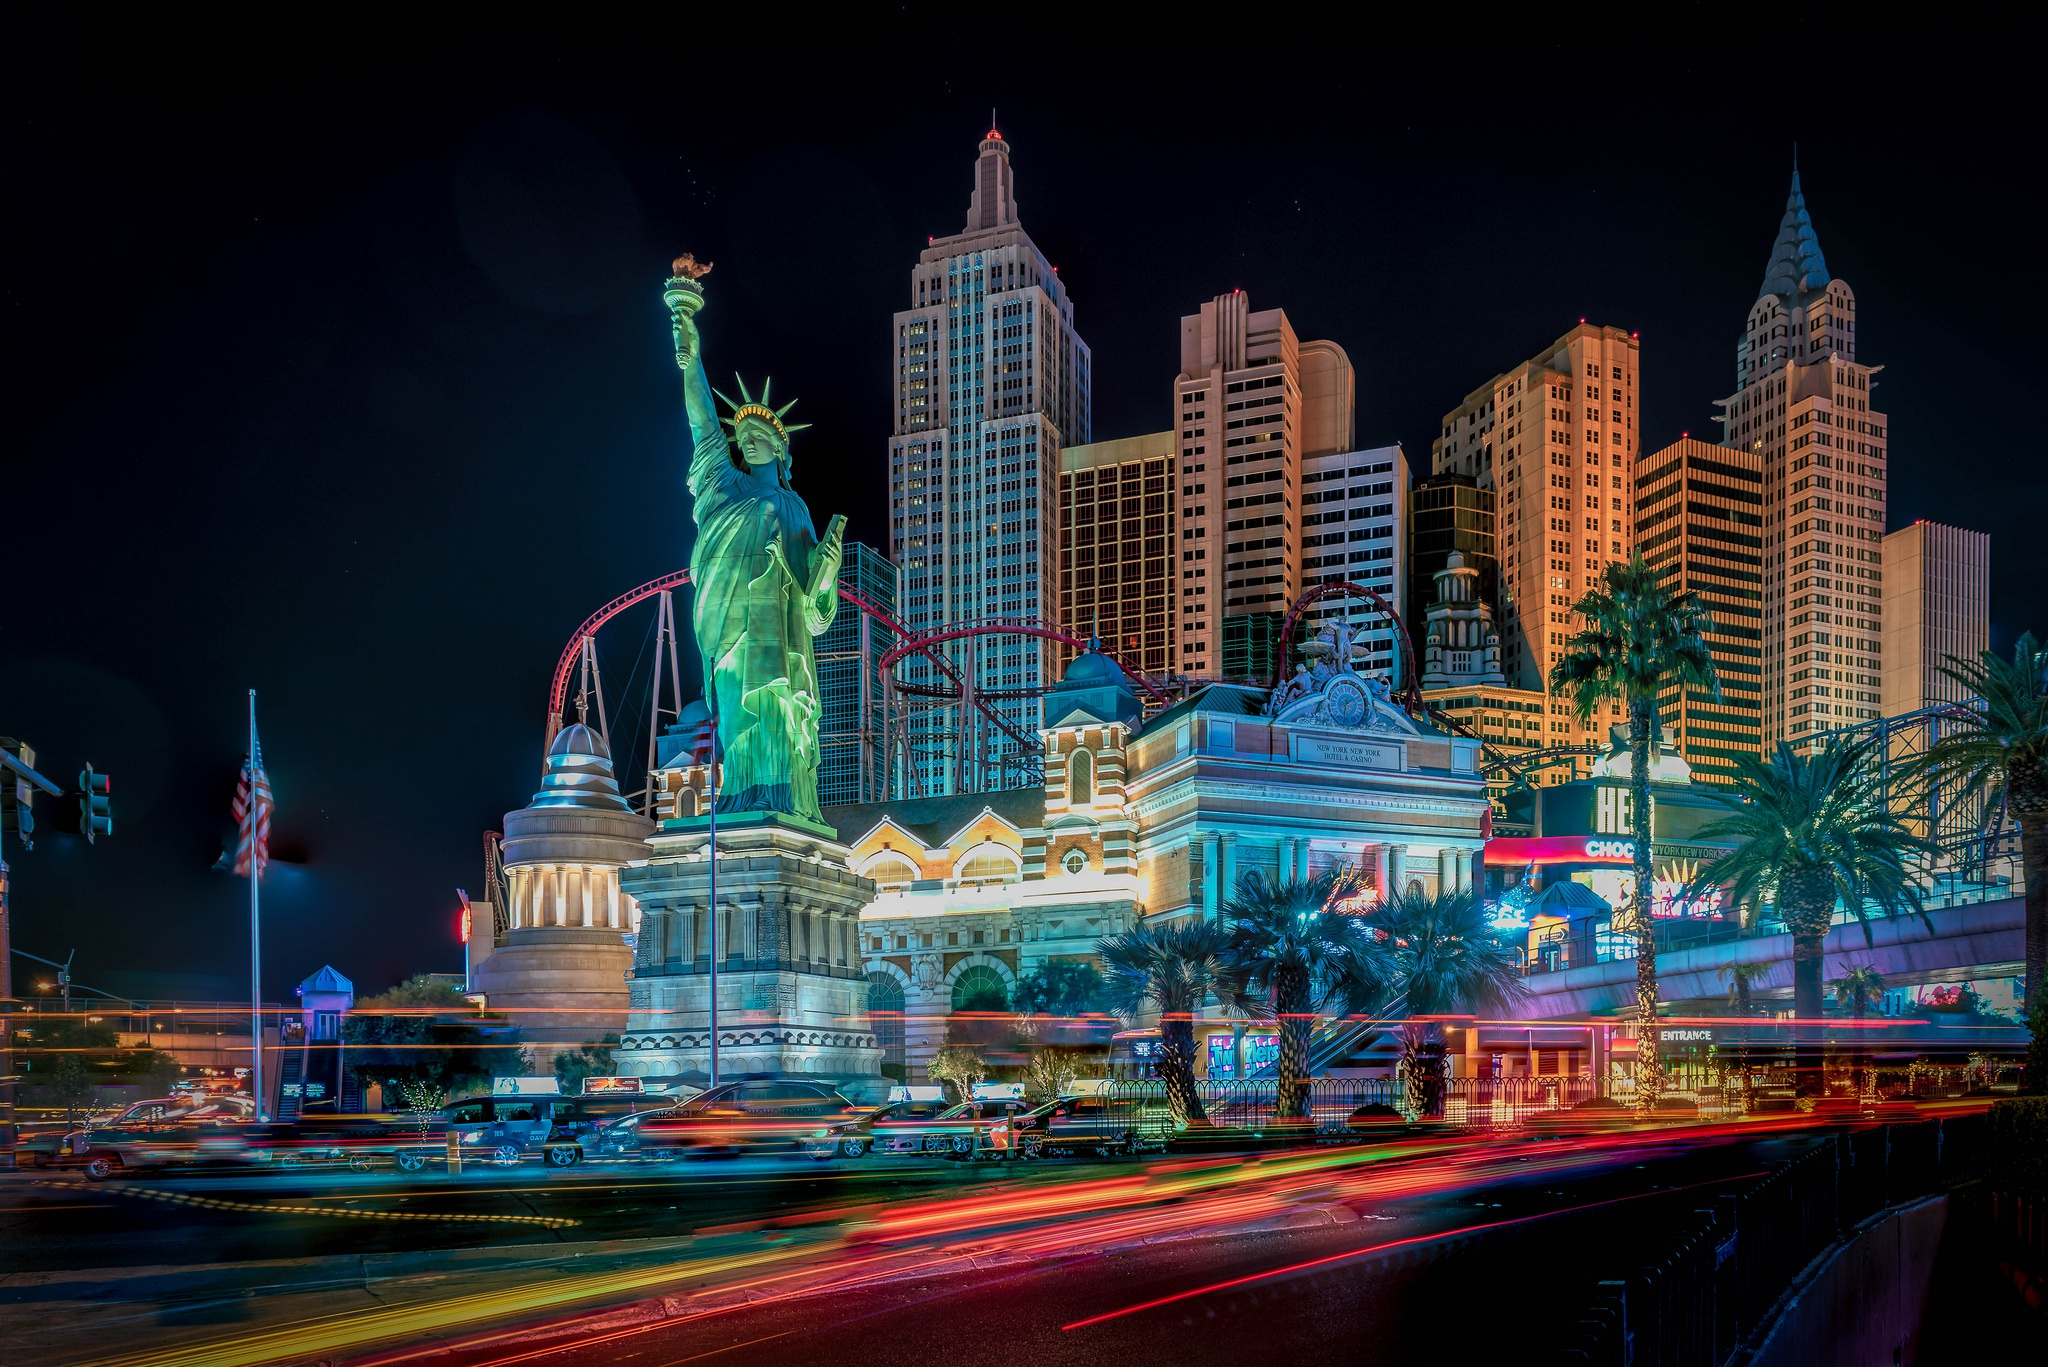 Las Vegas Backgrounds Wallpapers: Las Vegas HD Wallpaper